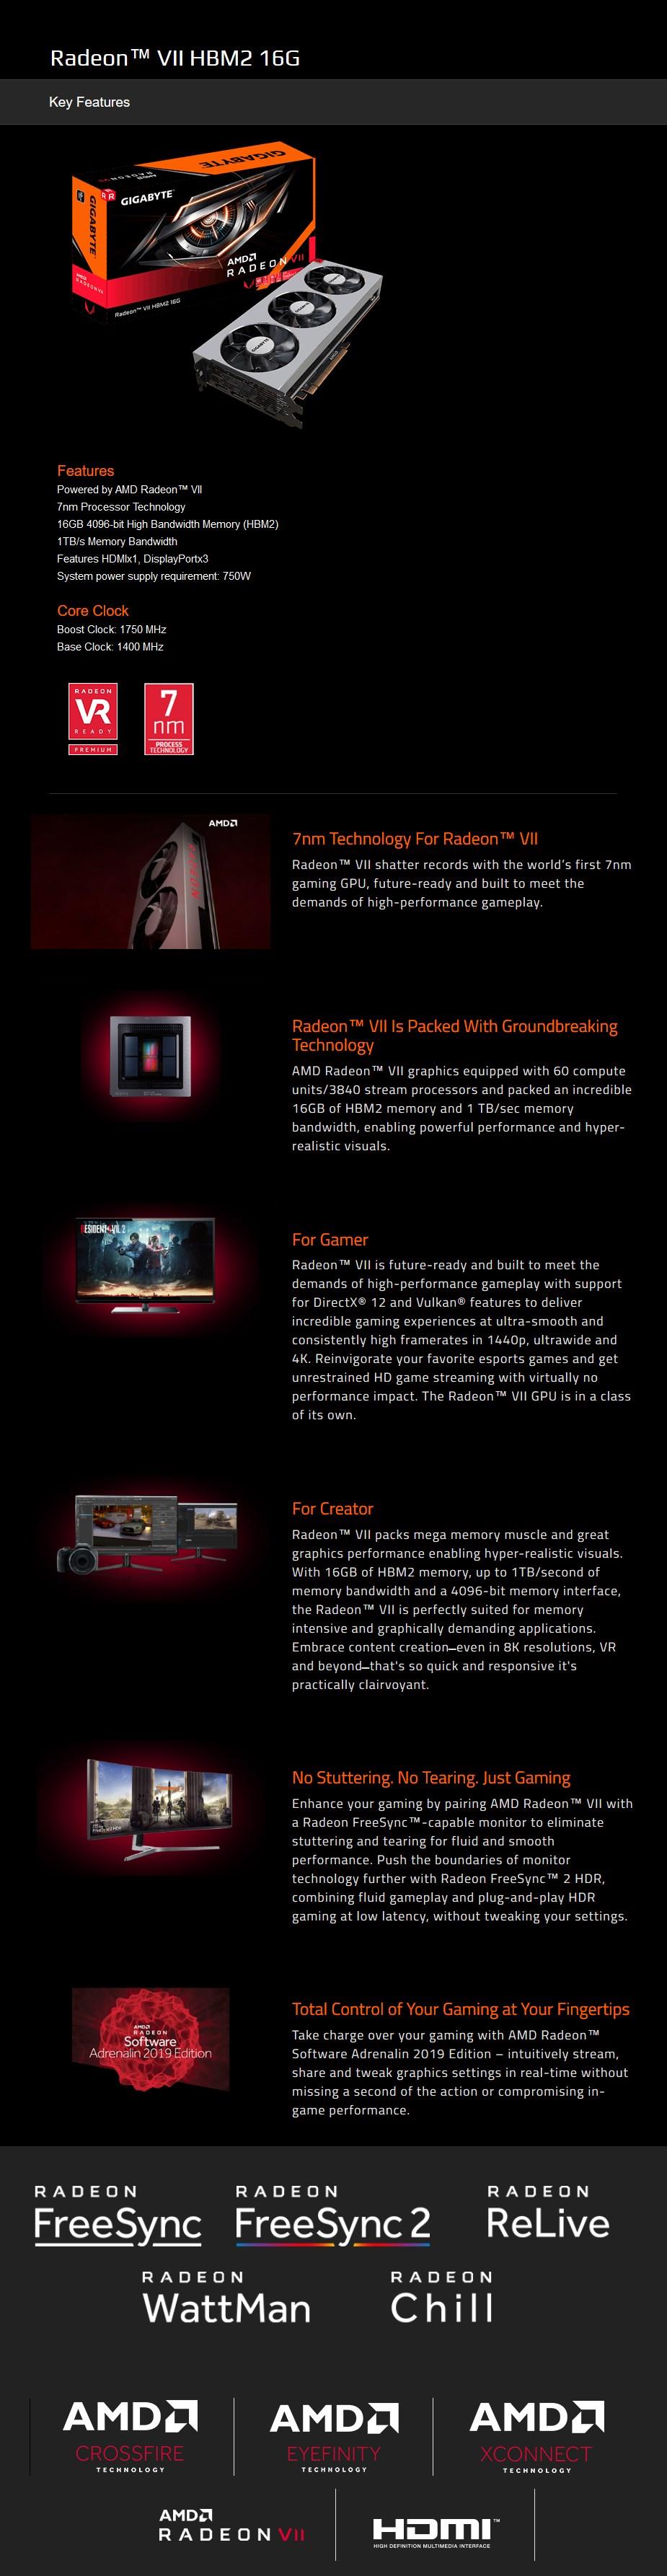 Gigabyte Radeon VII 16GB Video Card - Desktop Overview 1